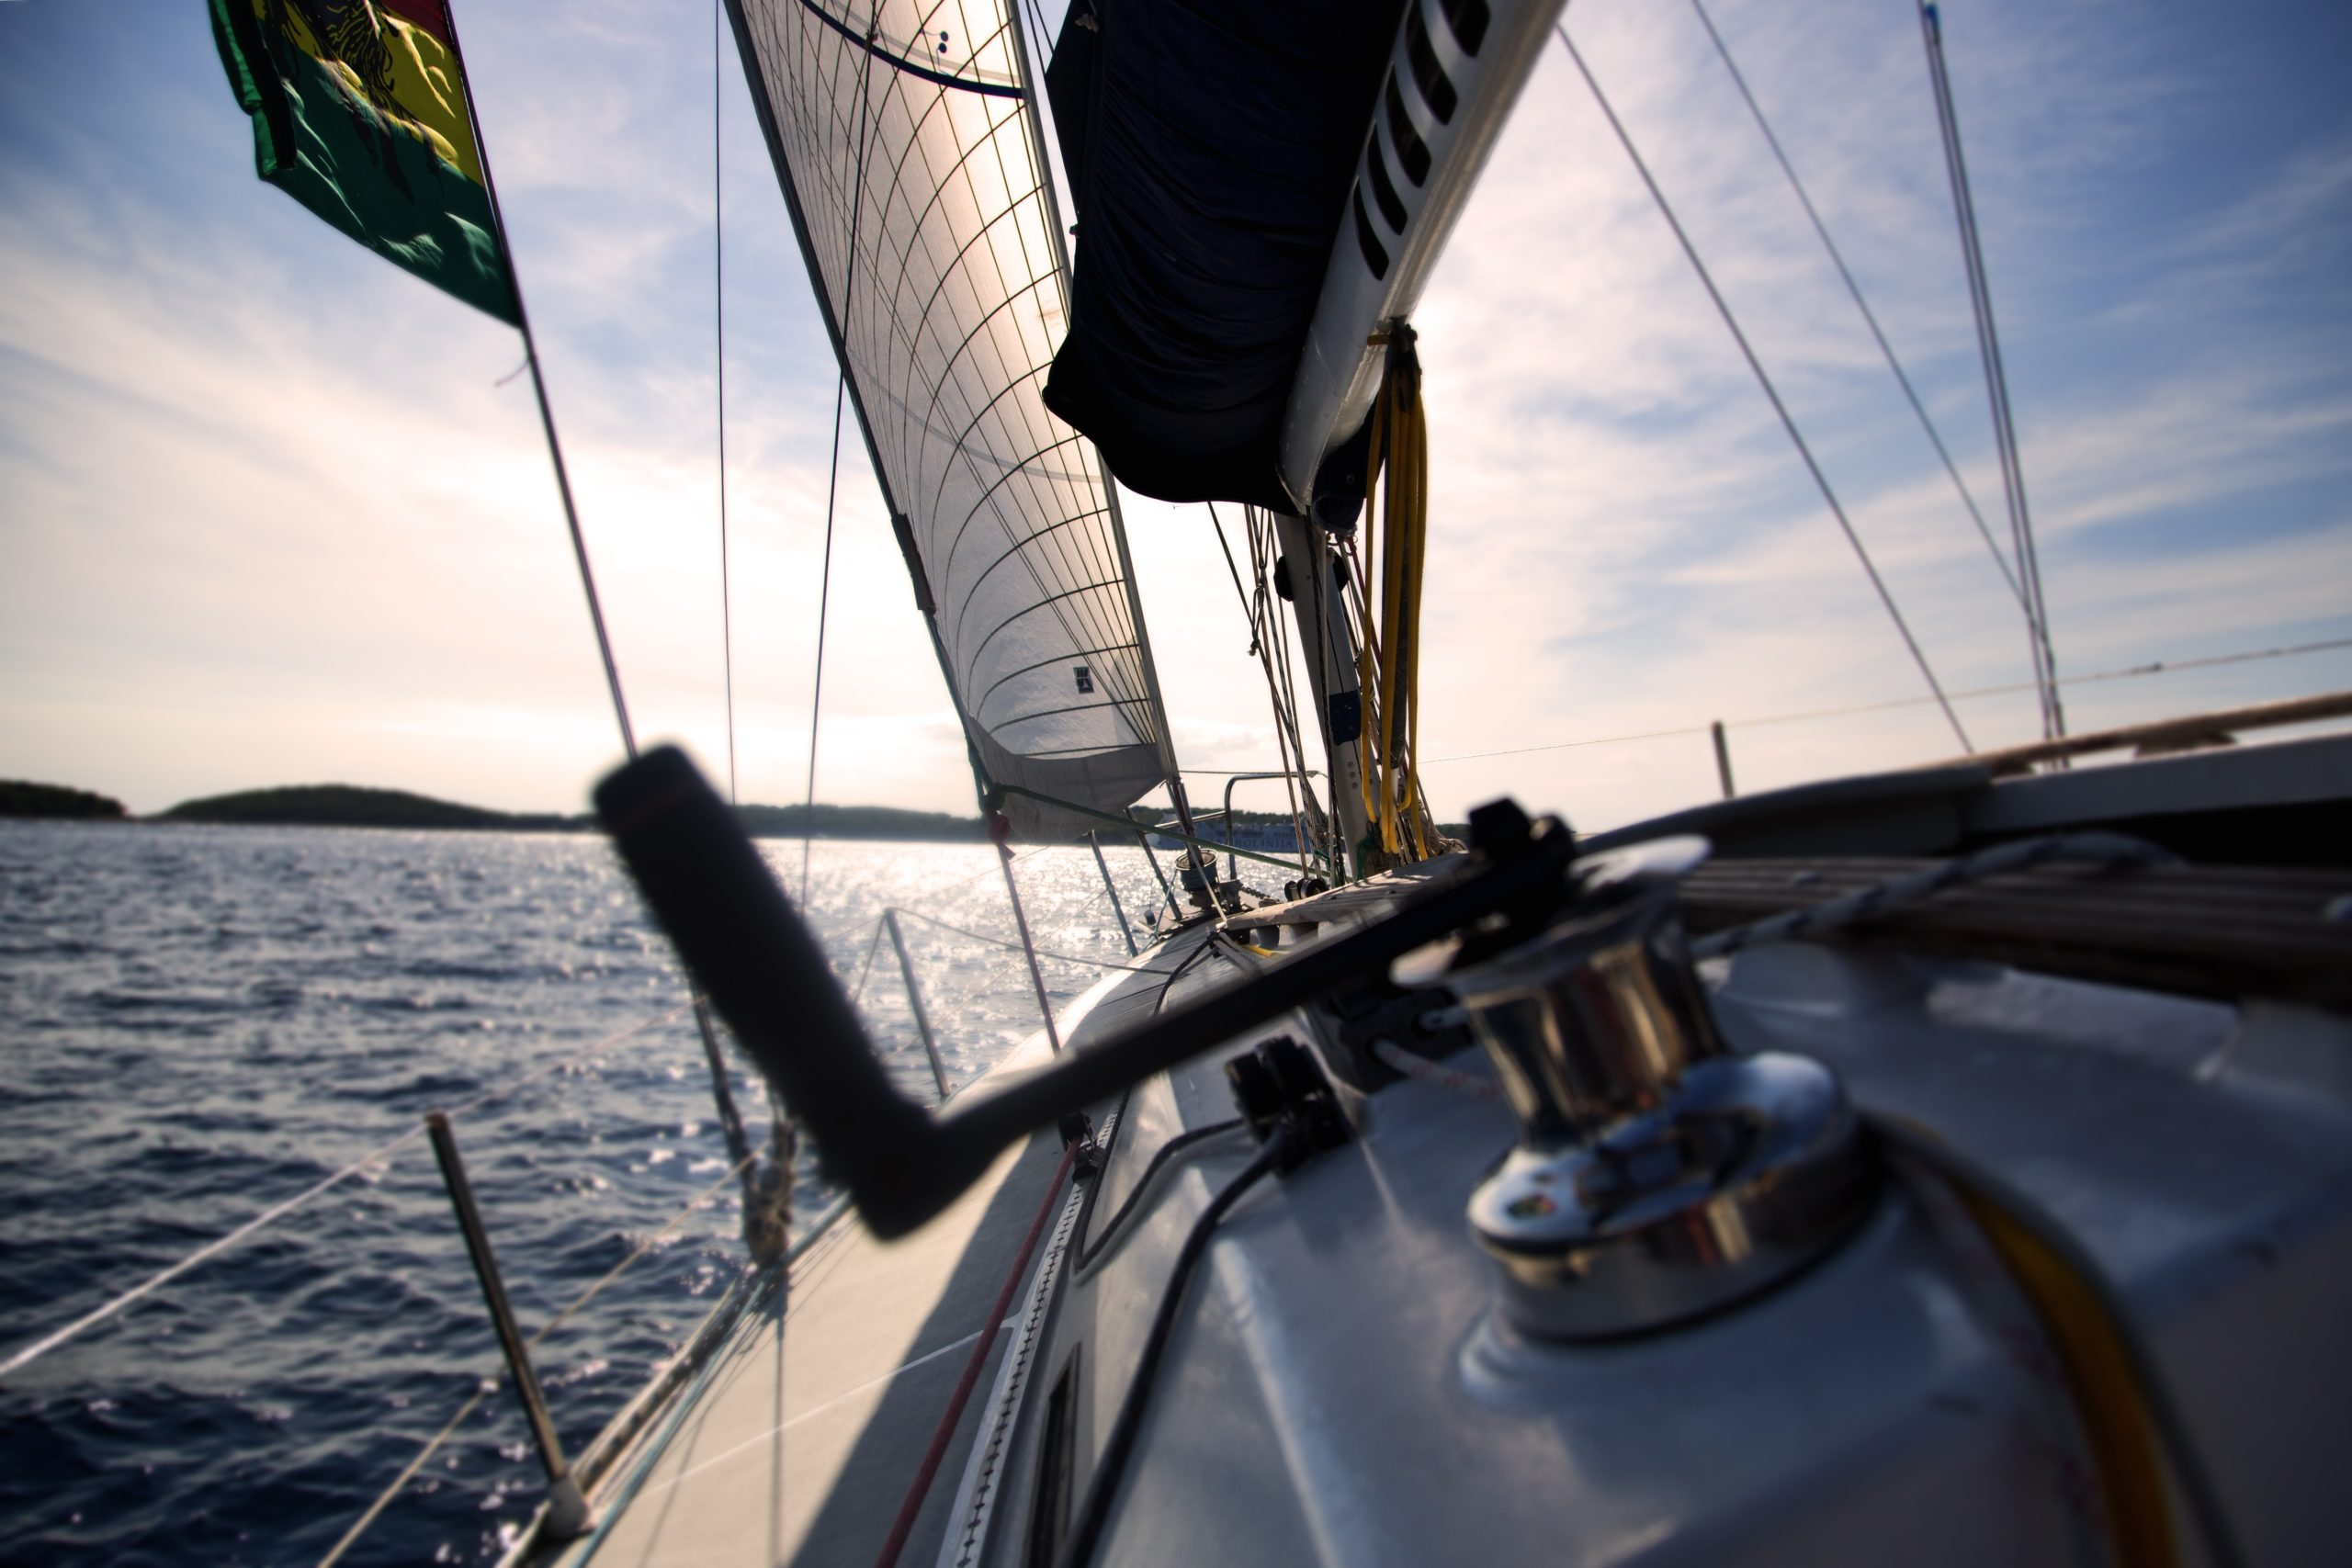 LOOPINGS Innovation Systems Potenzialgespräch Abenteuer Fahrtwind Motivation